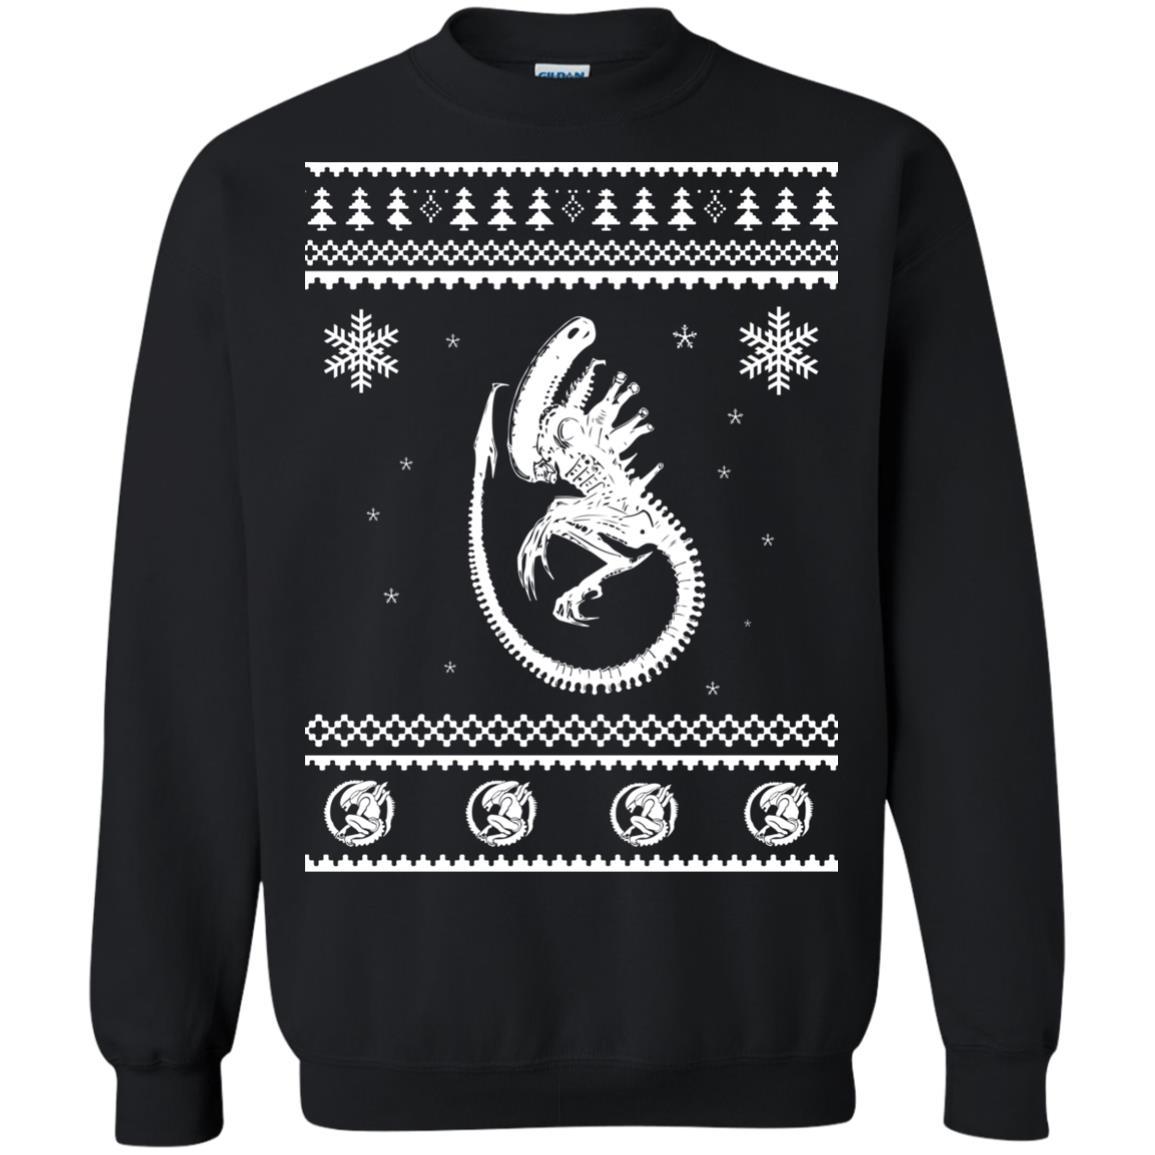 image 2847 - Xeno-mas - Aliens Xenomorph Christmas Sweater, Shirt, Hoodie